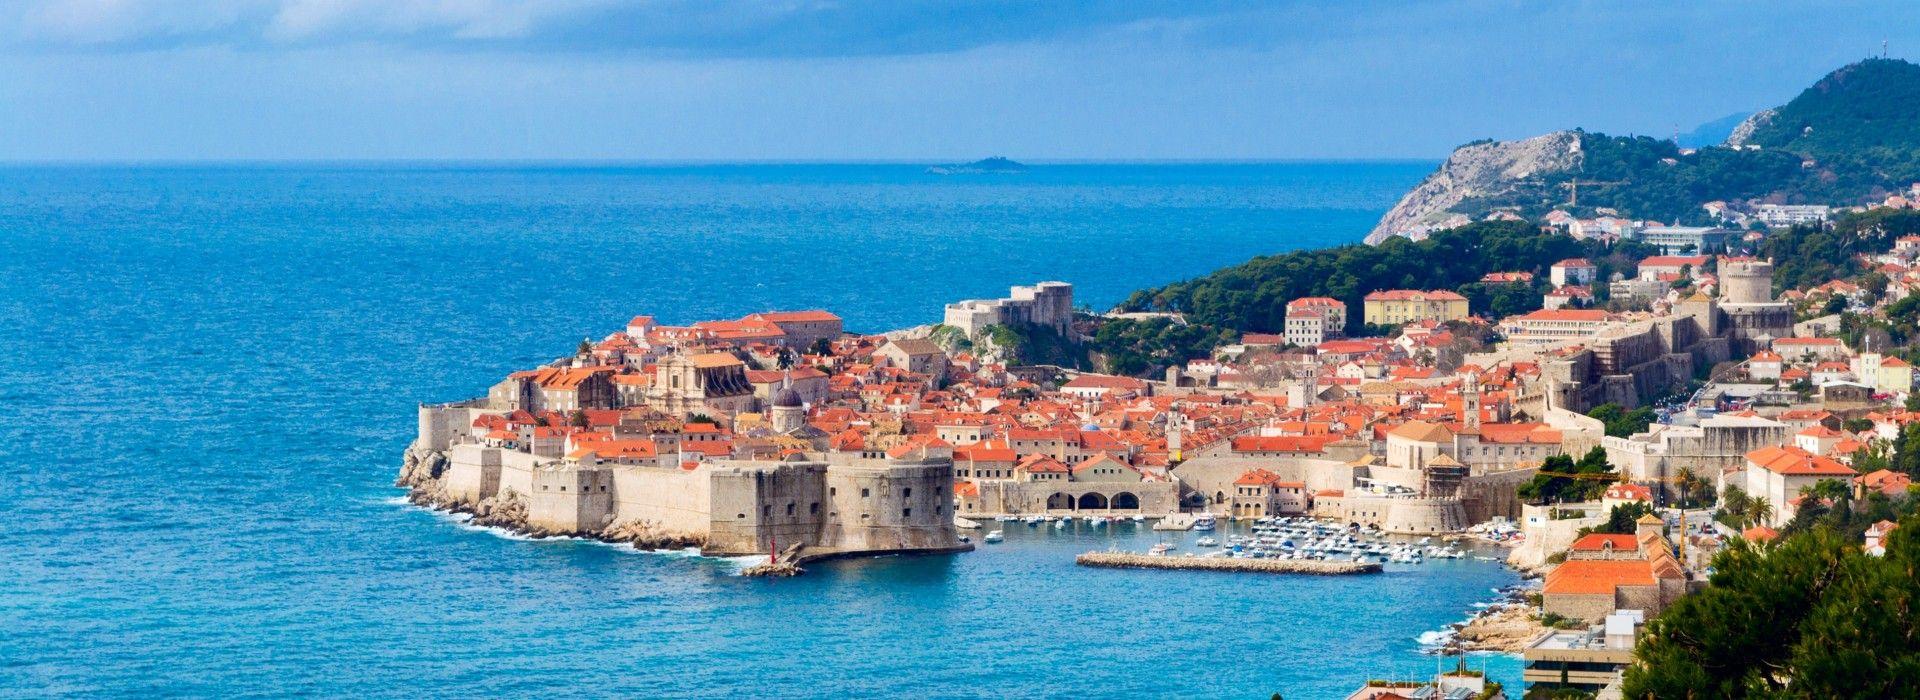 Food tours in Dubrovnik